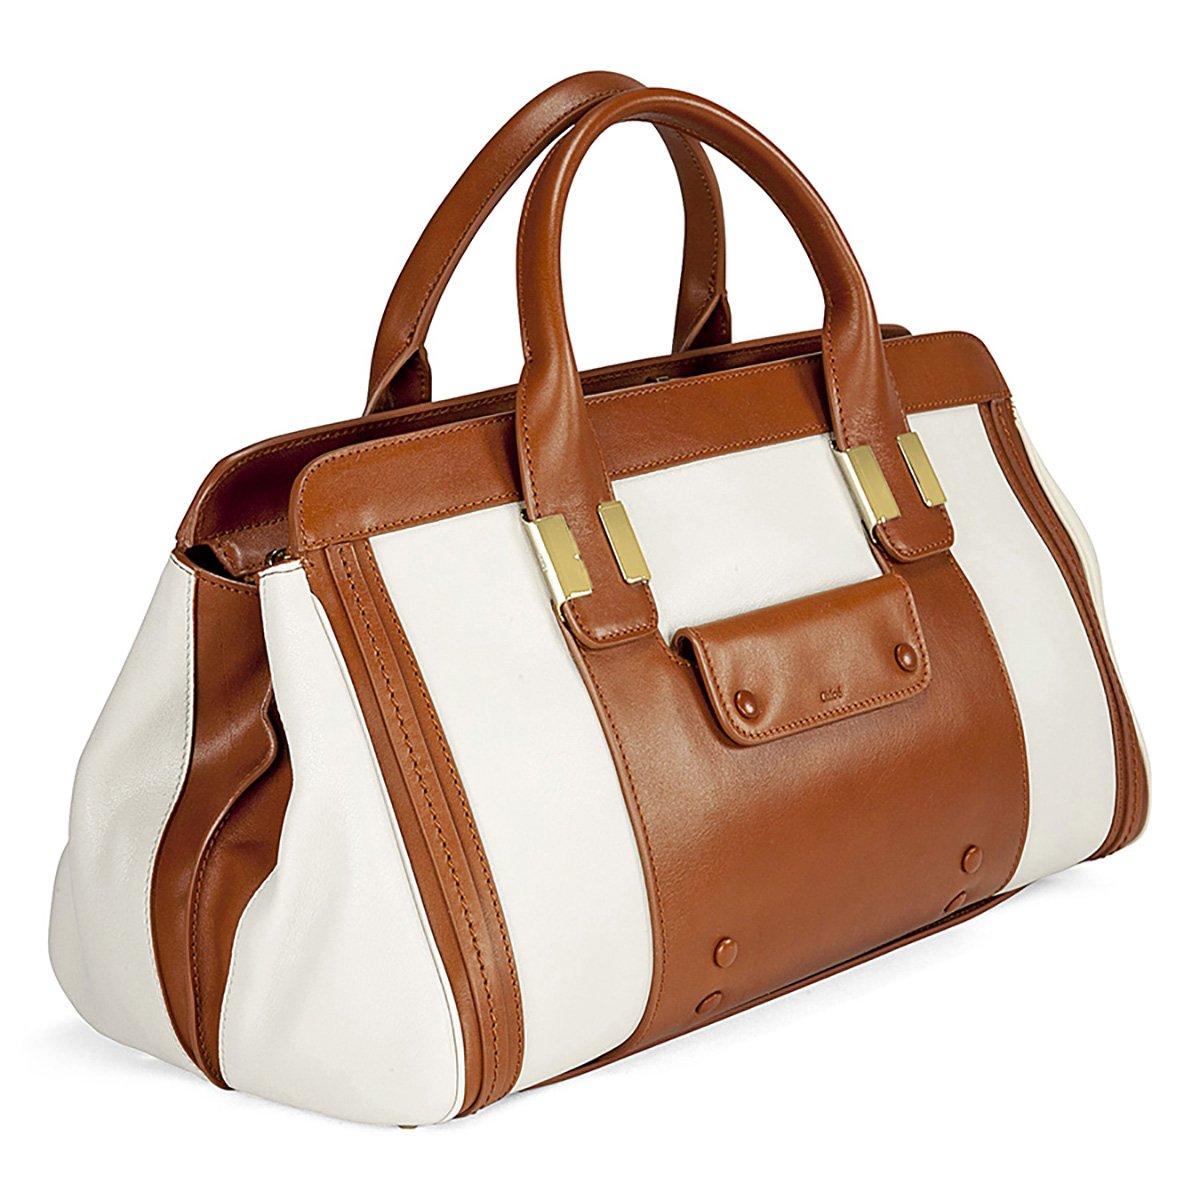 d38c844655 Chloe Alice Tan - White Leather Shoulder Bag 3S0161-703-1: Handbags ...